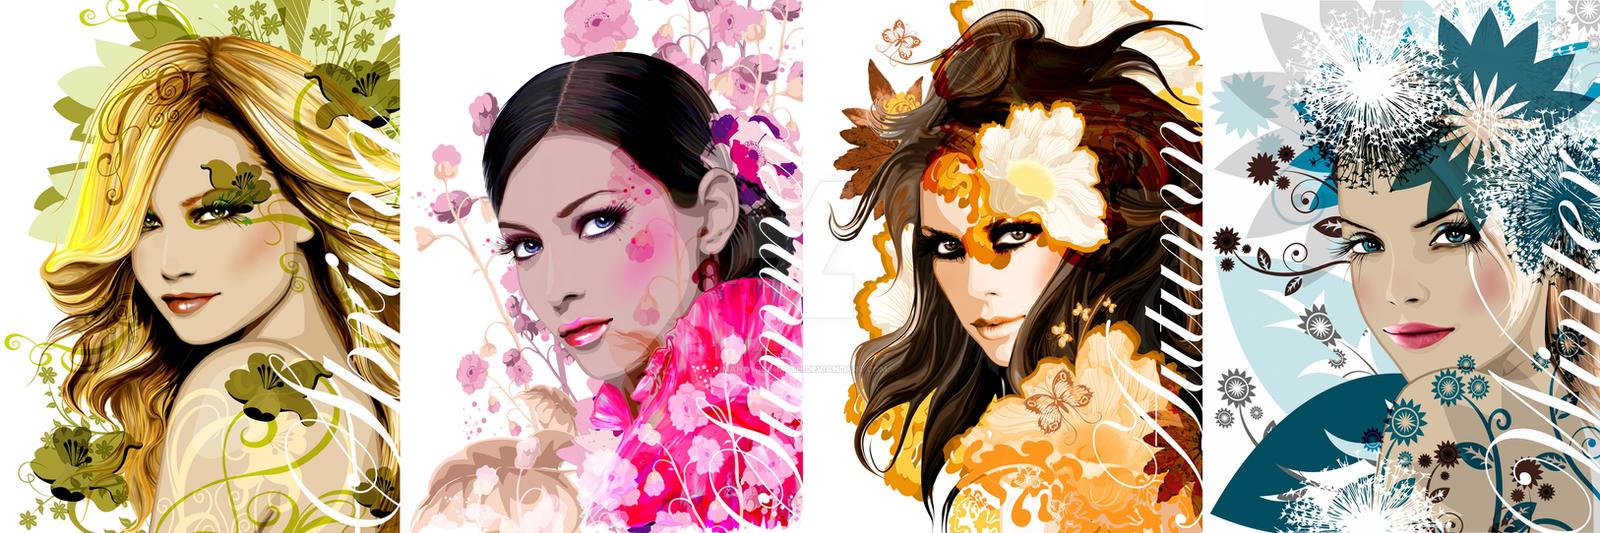 seasons series by mandyreinmuth